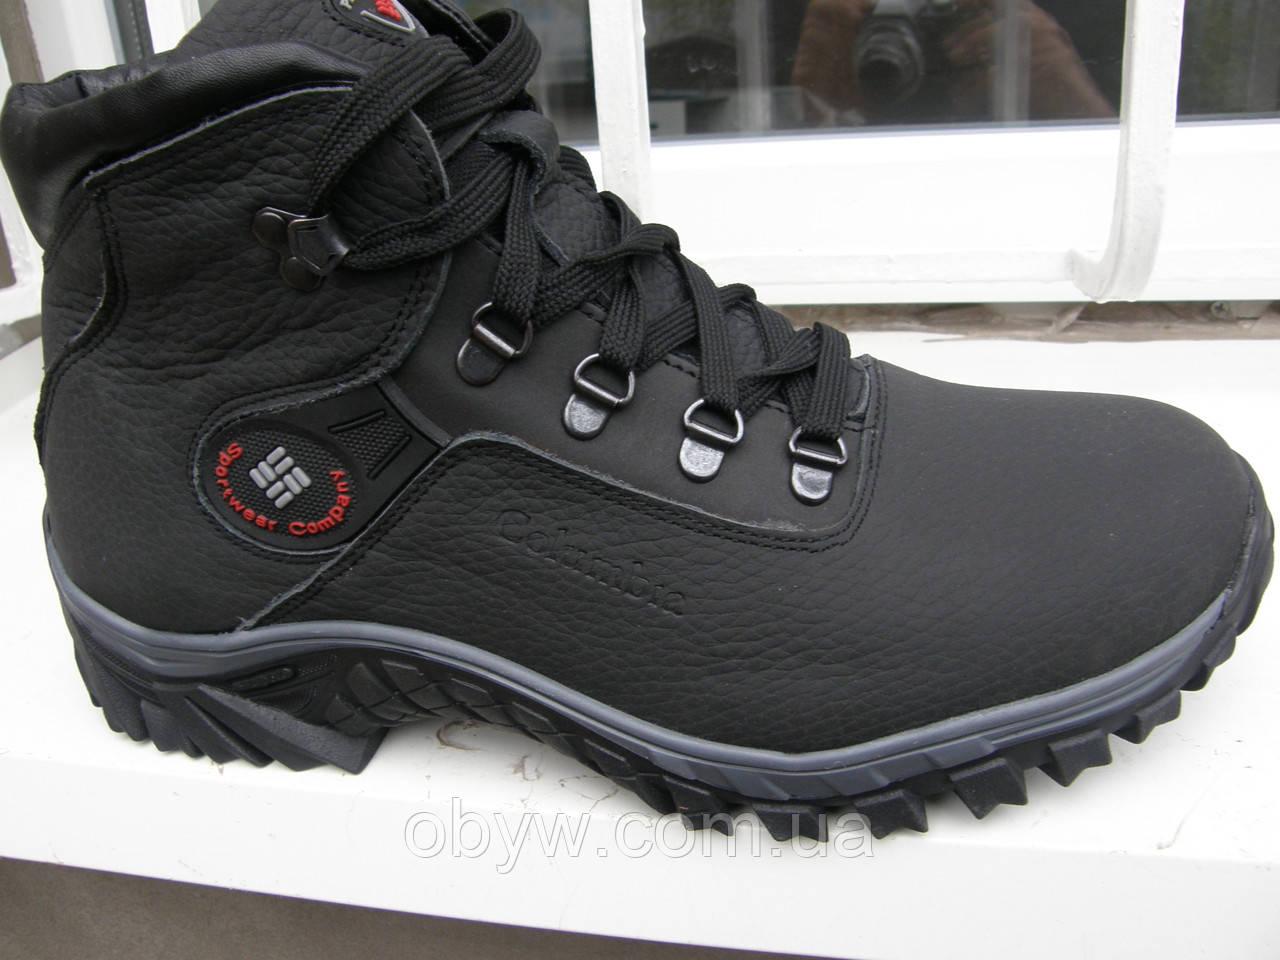 Cаlаmbia ботинки мужские зимние.